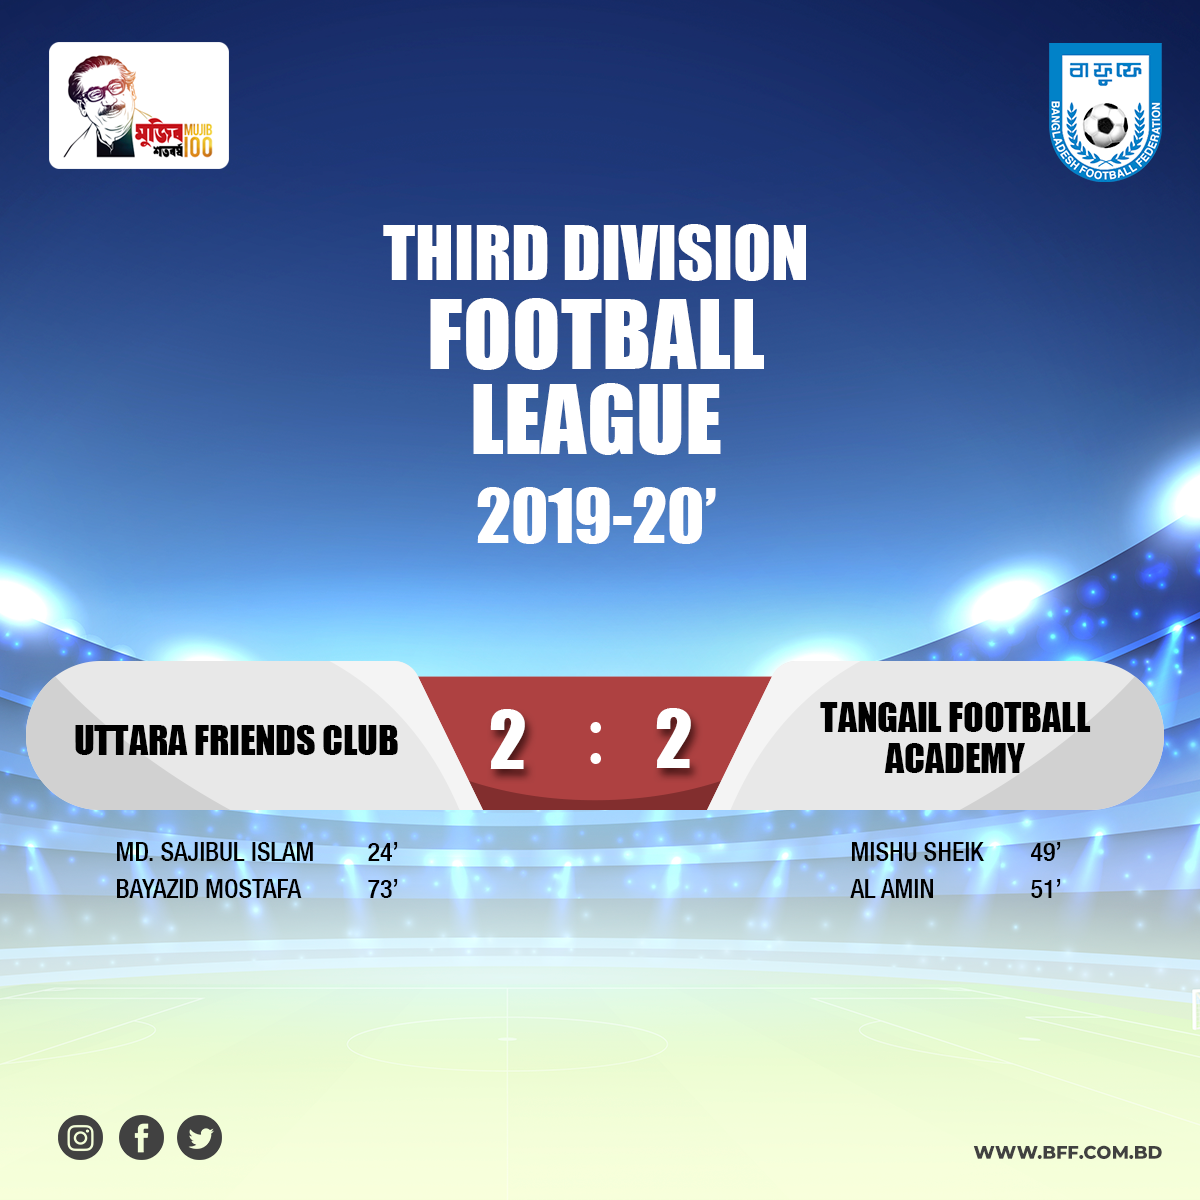 Uttara Friends Club and Tangail Football Academy  draws the match